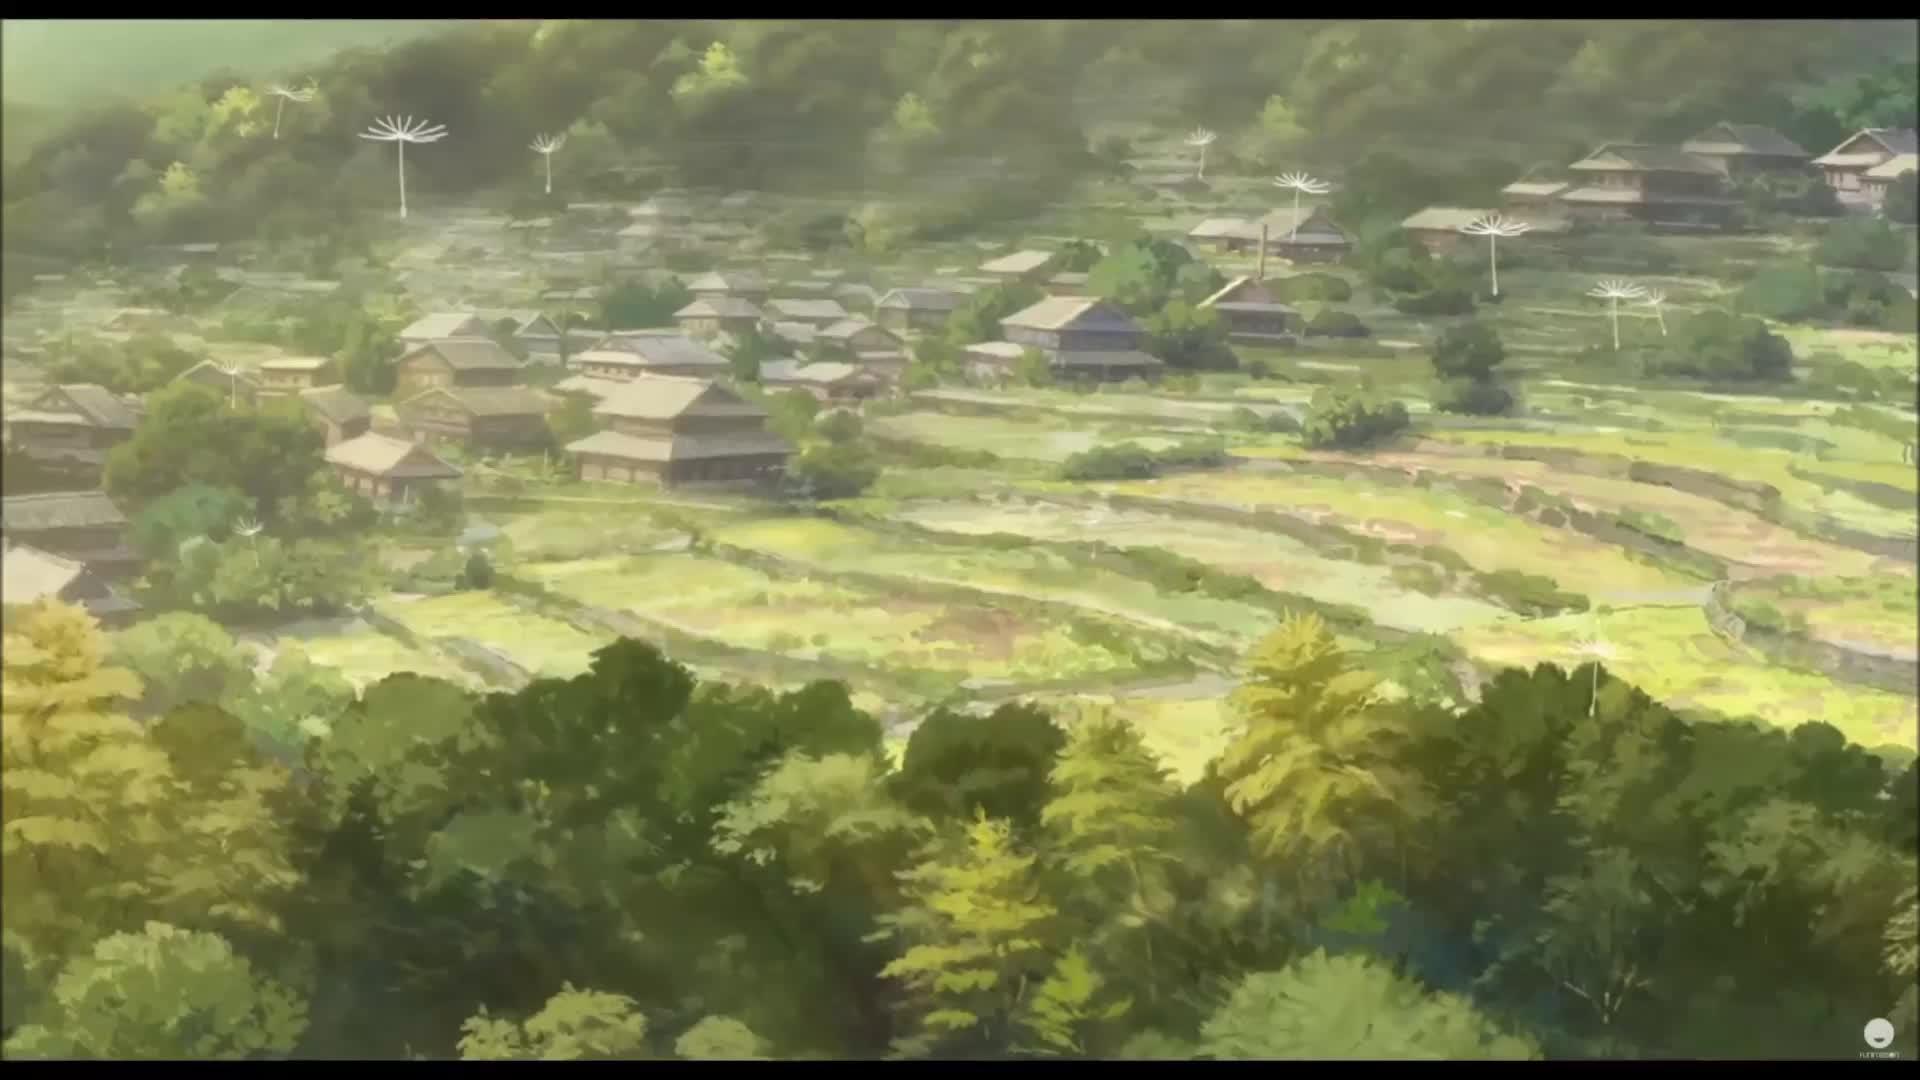 anime, funimation, in this corner of the world, inthiscorneroftheworld, kono sekai no katasumi ni, Dandelion seeds woft through the air. GIFs